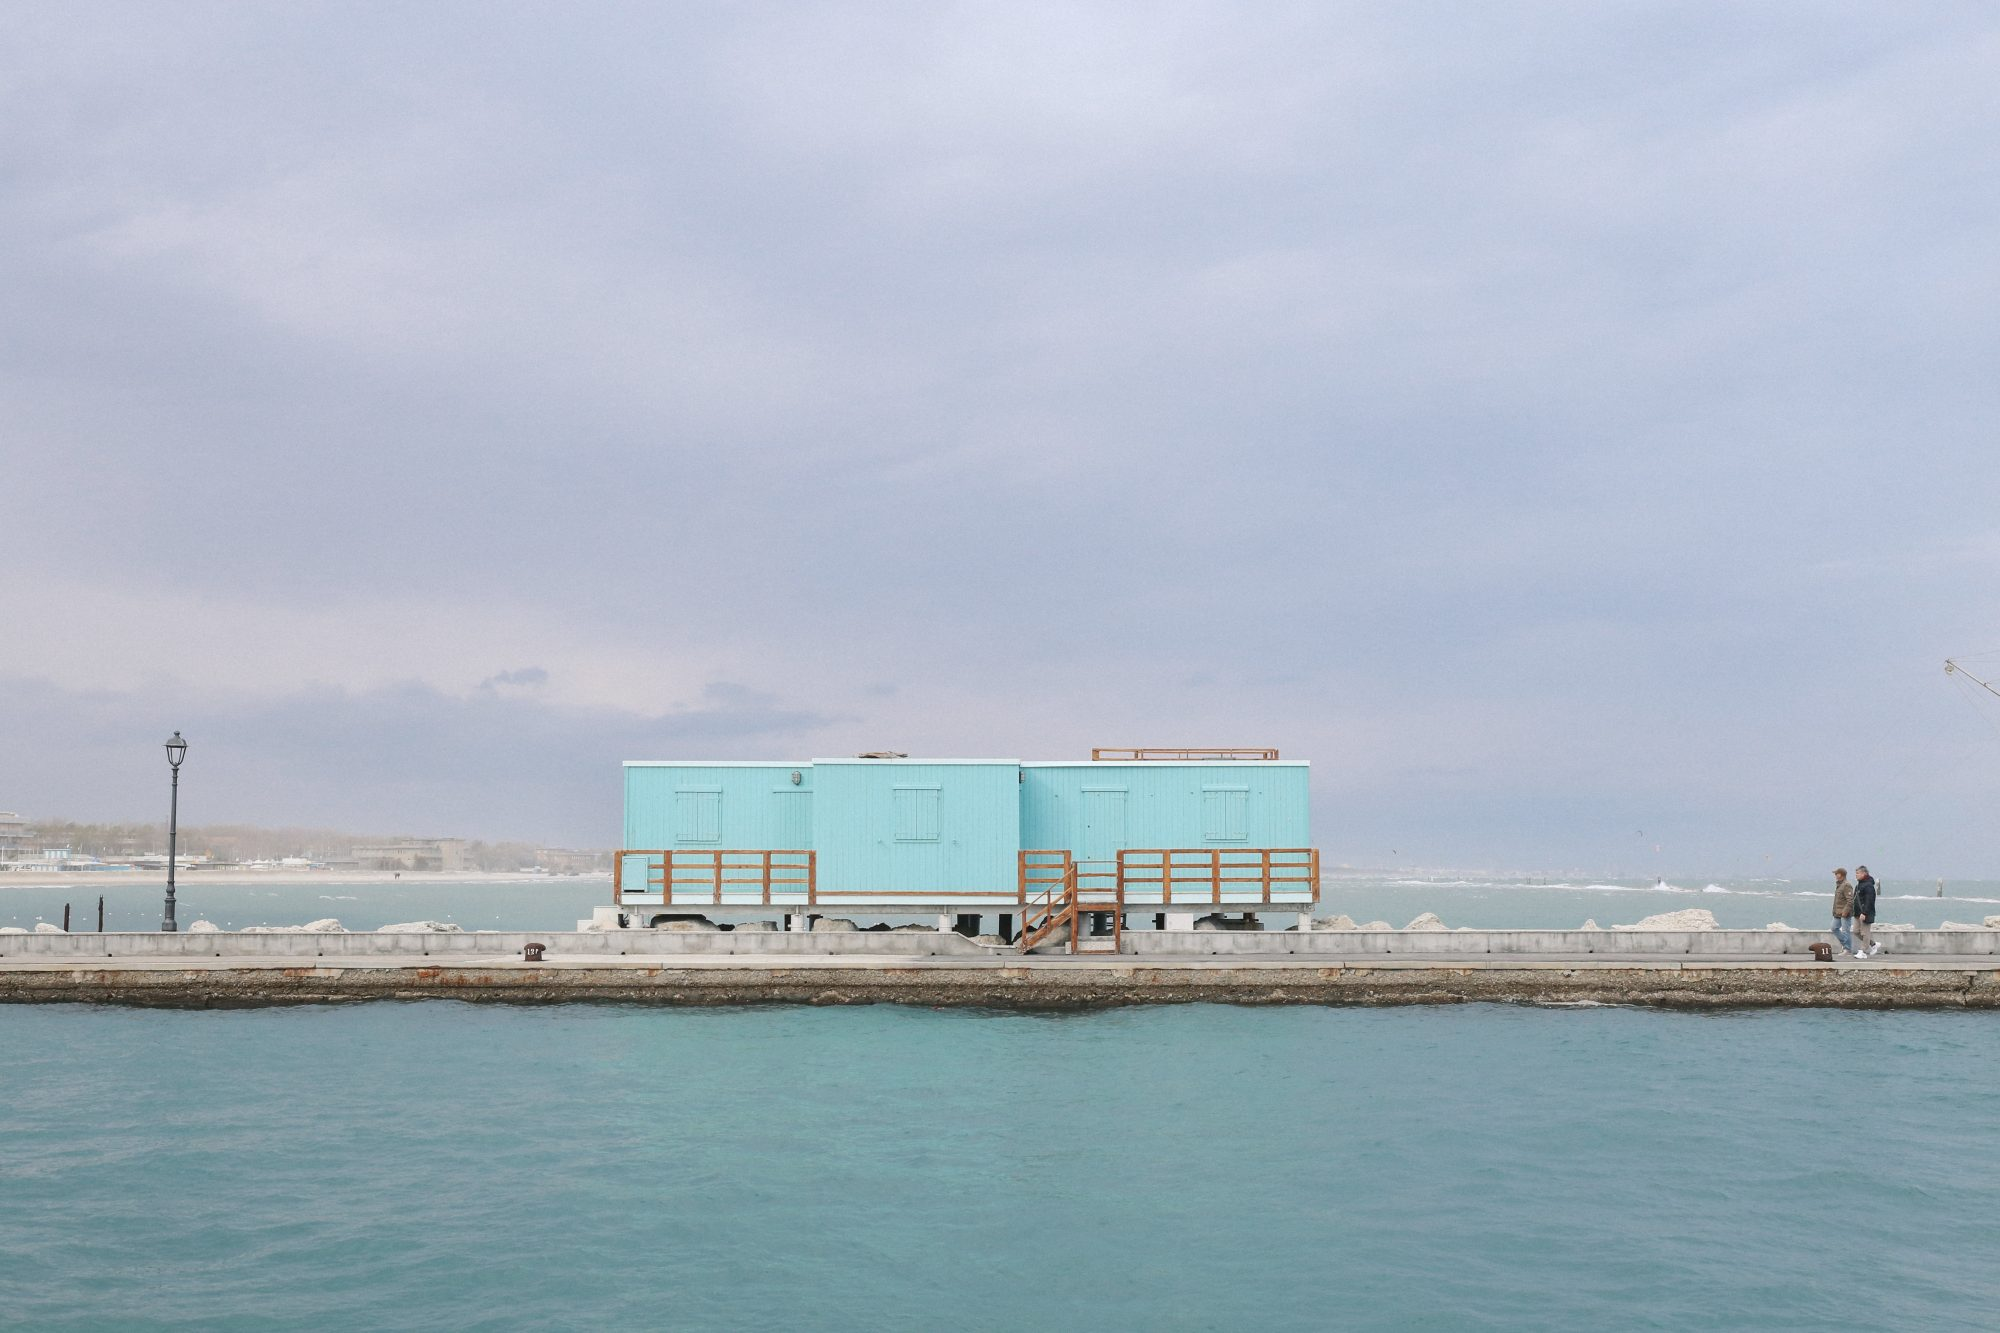 LandOutriders - Un weekend in Romagna con Pier Giulio Caivano | Collater.al 12